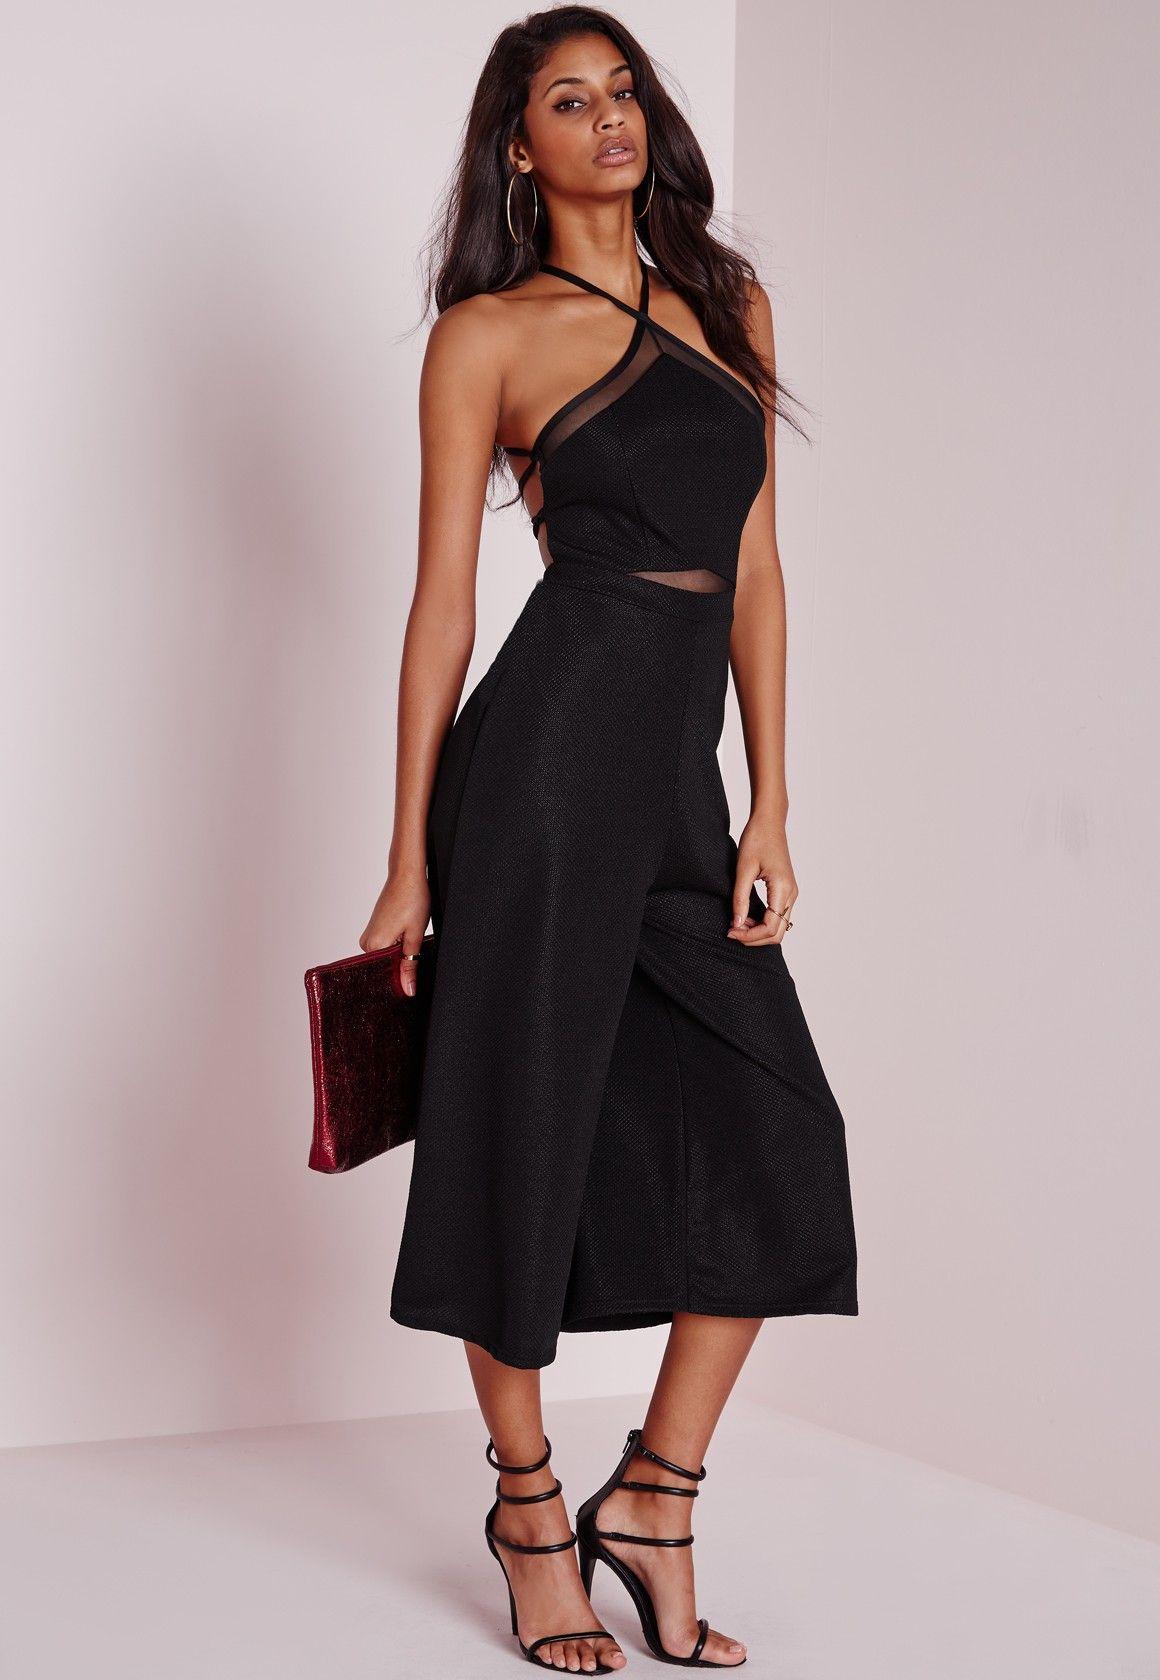 a9112a4f4692 Missguided - Mesh Insert Halterneck Culotte Jumpsuit Black